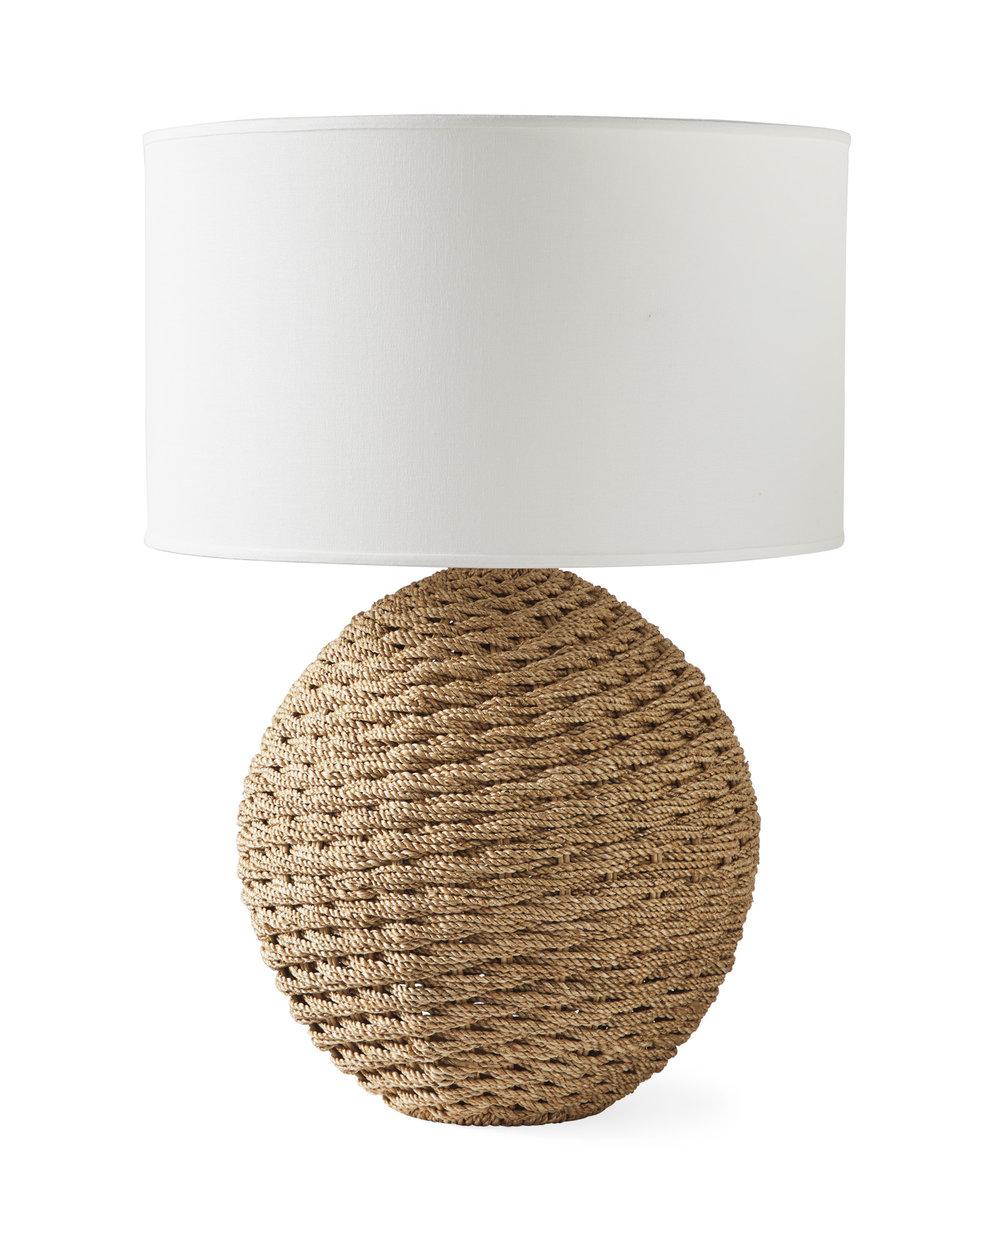 Lighting_Abott_Round_Table_Lamp_MV_0085_Crop_SH.jpg